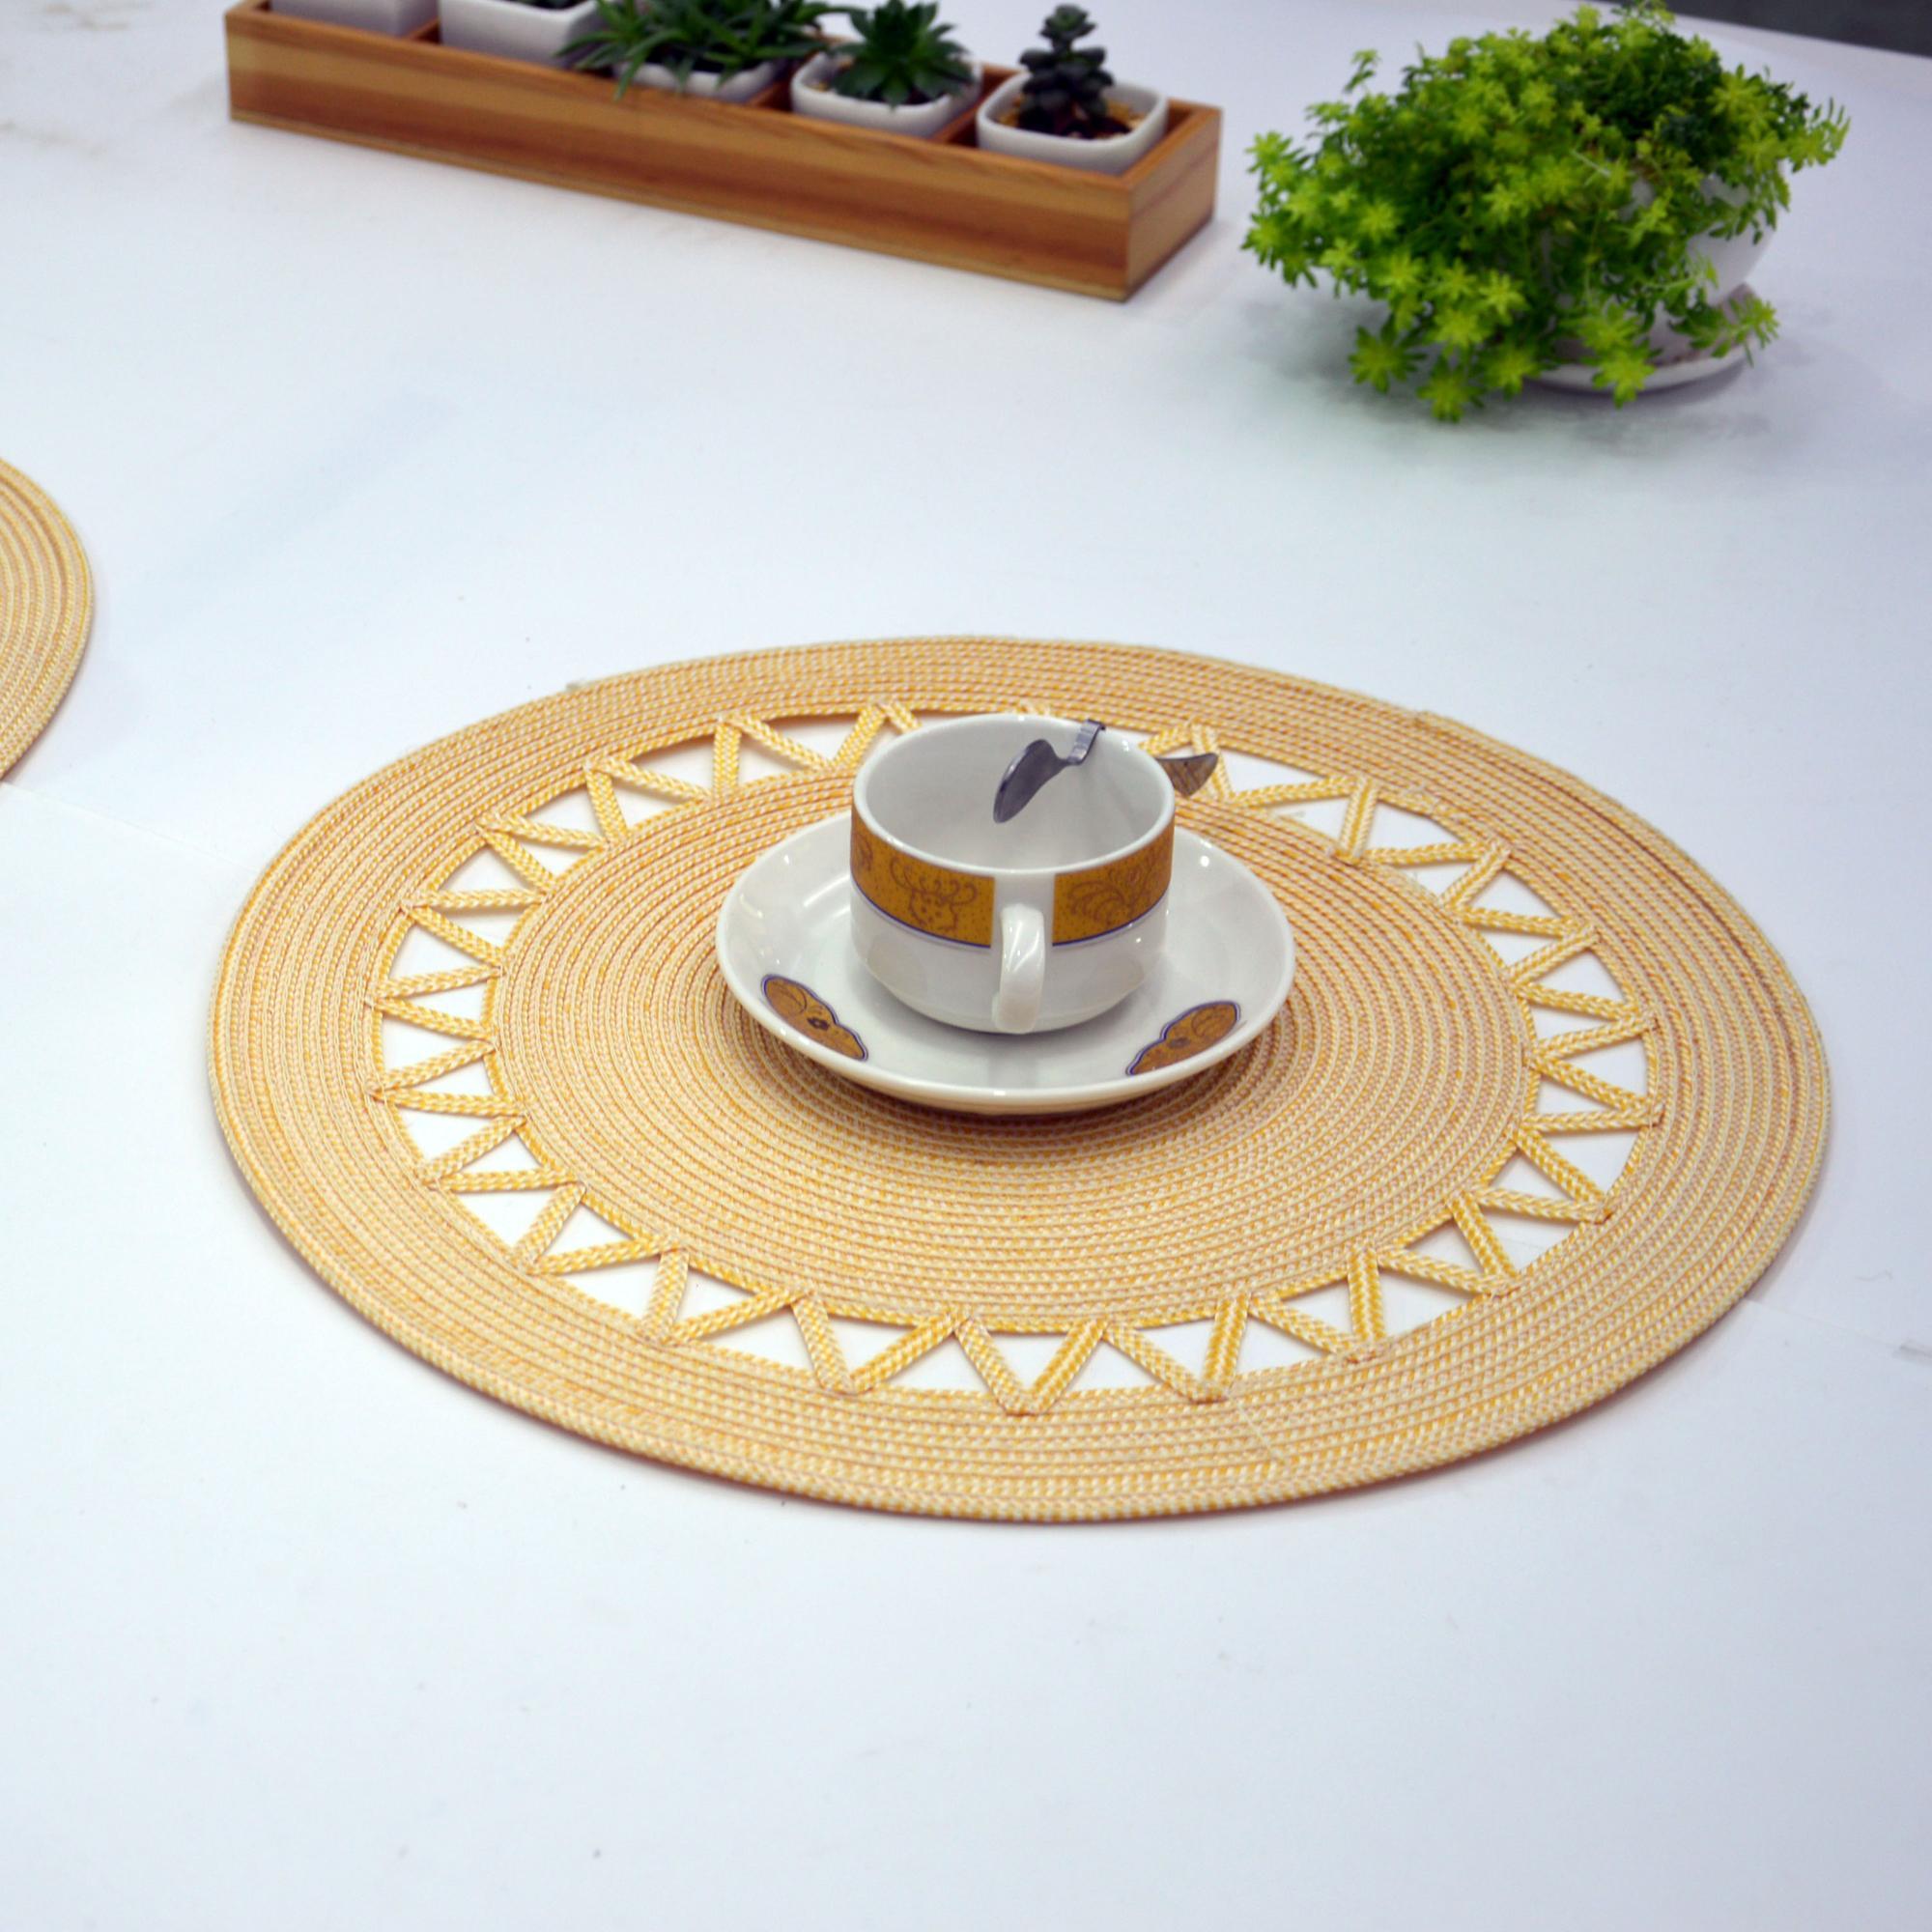 Reusable woven straw kitchen pvc placemats,paper mat